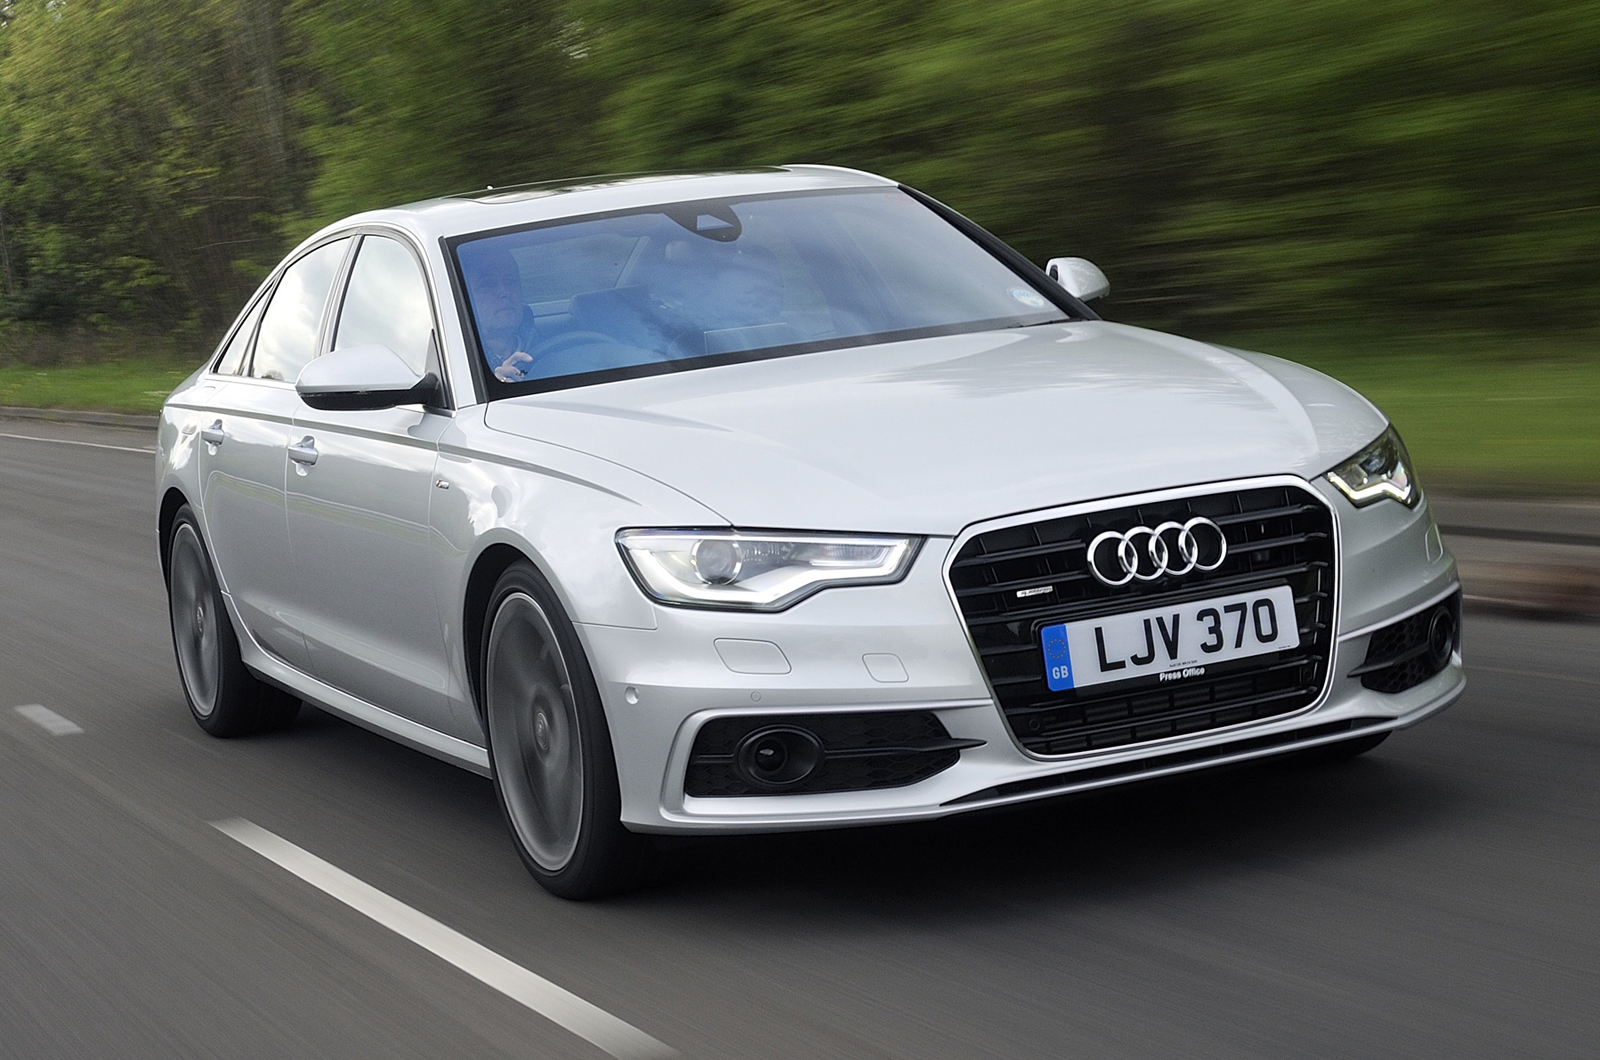 Audi A6 Saloon 20 Tdi Ultra S Tronic S Line First Drive